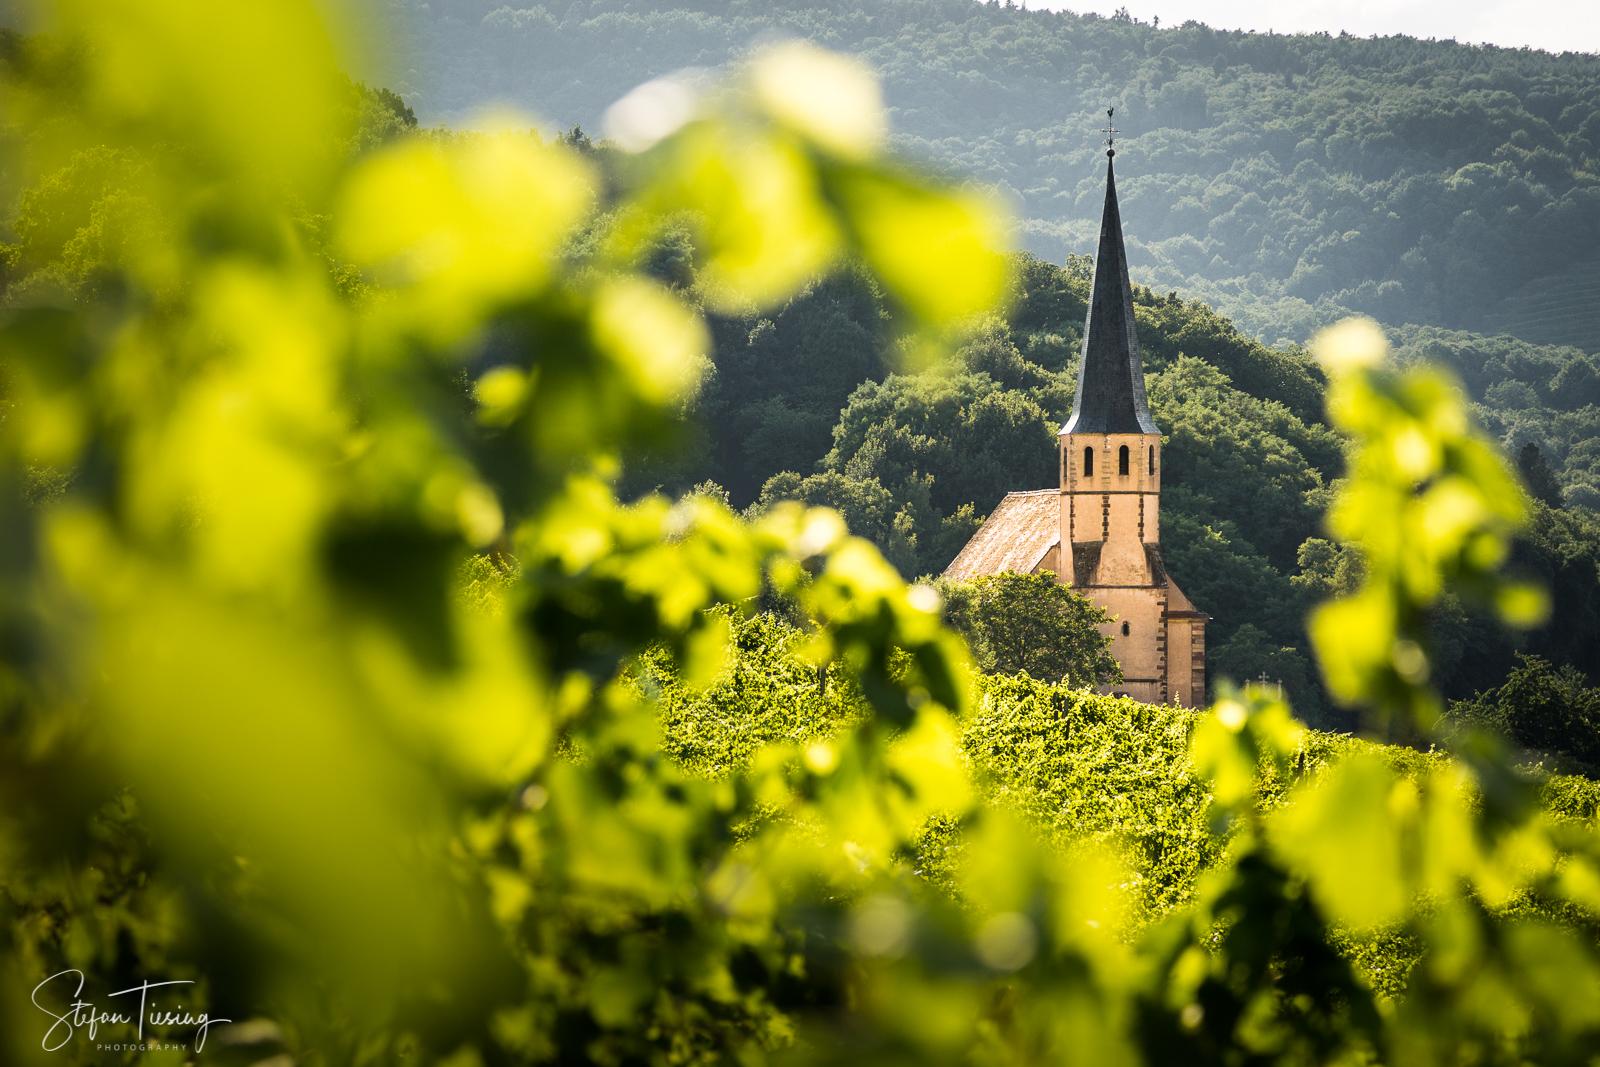 Église Saint-André at Andlau (Alsace), France